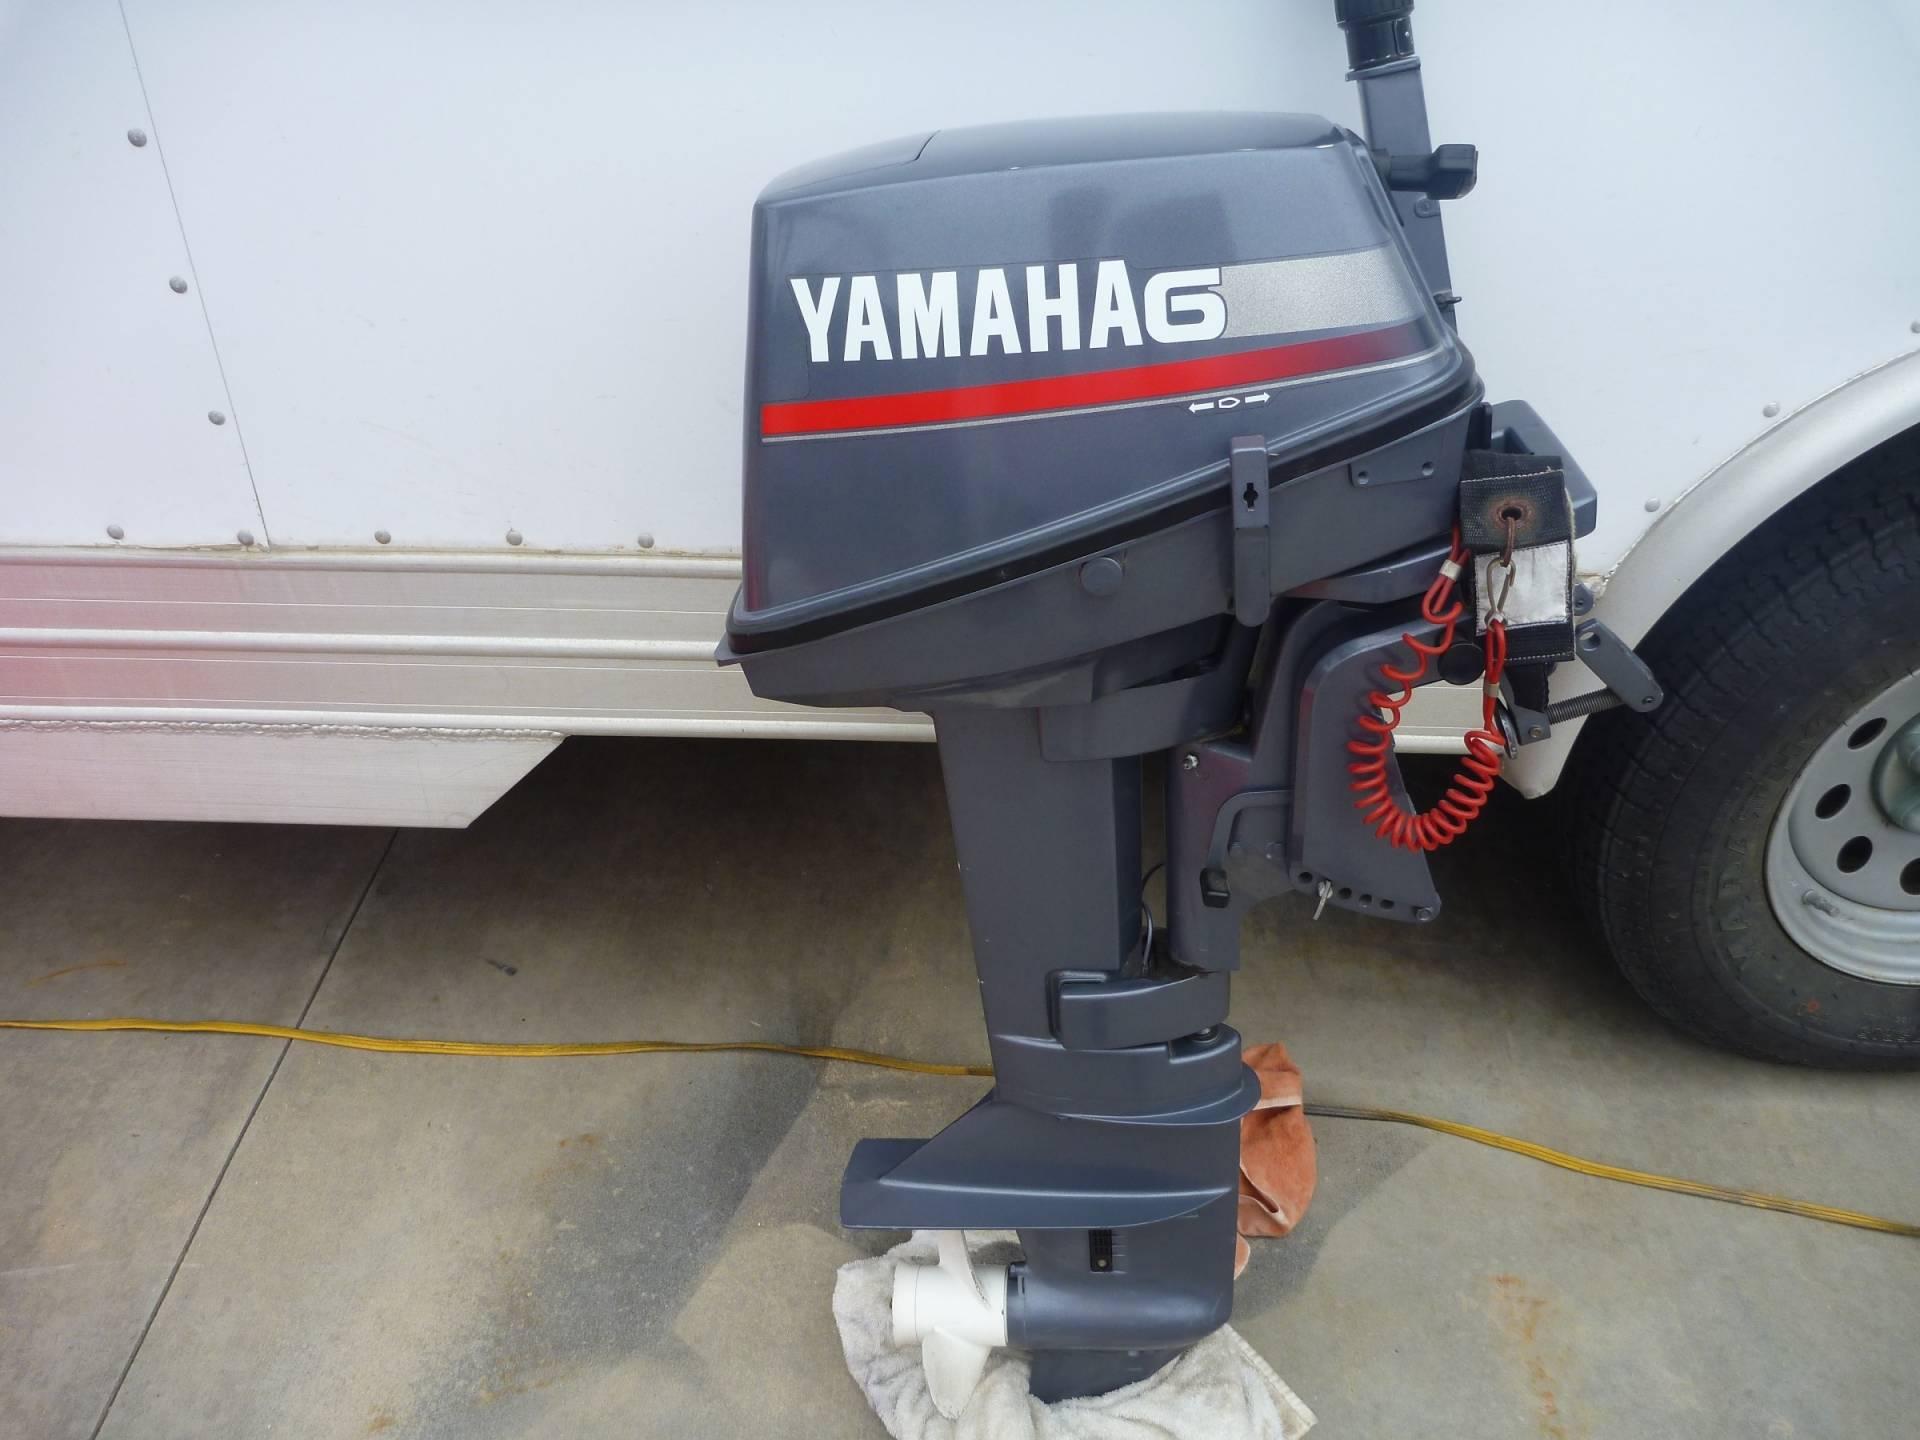 Yamaha 6hp Outboard Bloodydecks